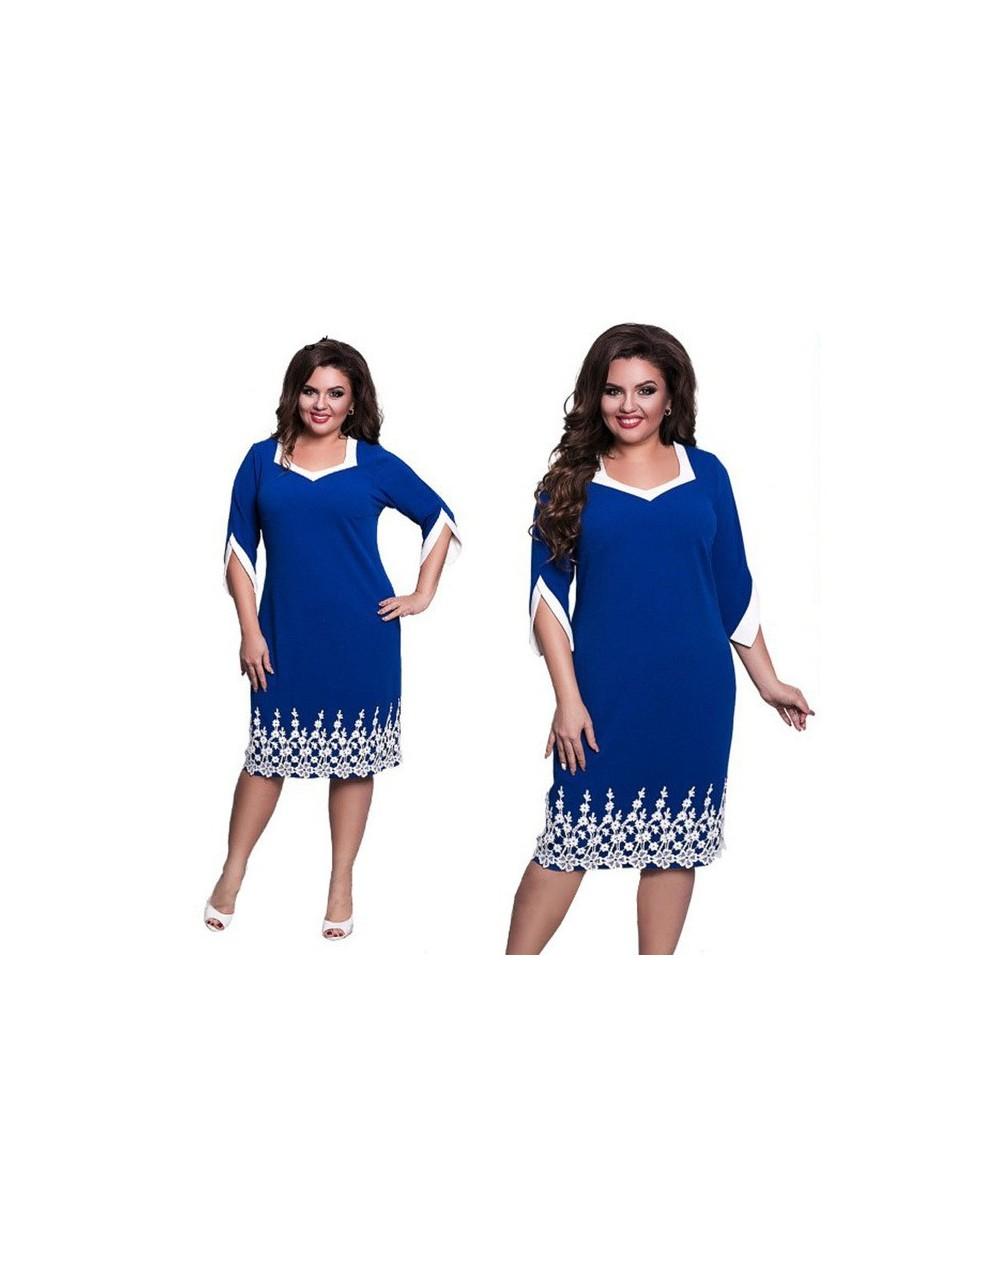 6XL Elegant Ladies Women Dress Fashion Sexy Party Plus Size Maxi Straight Dresses Casual Loose Large Sizes Slim Office Vesti...